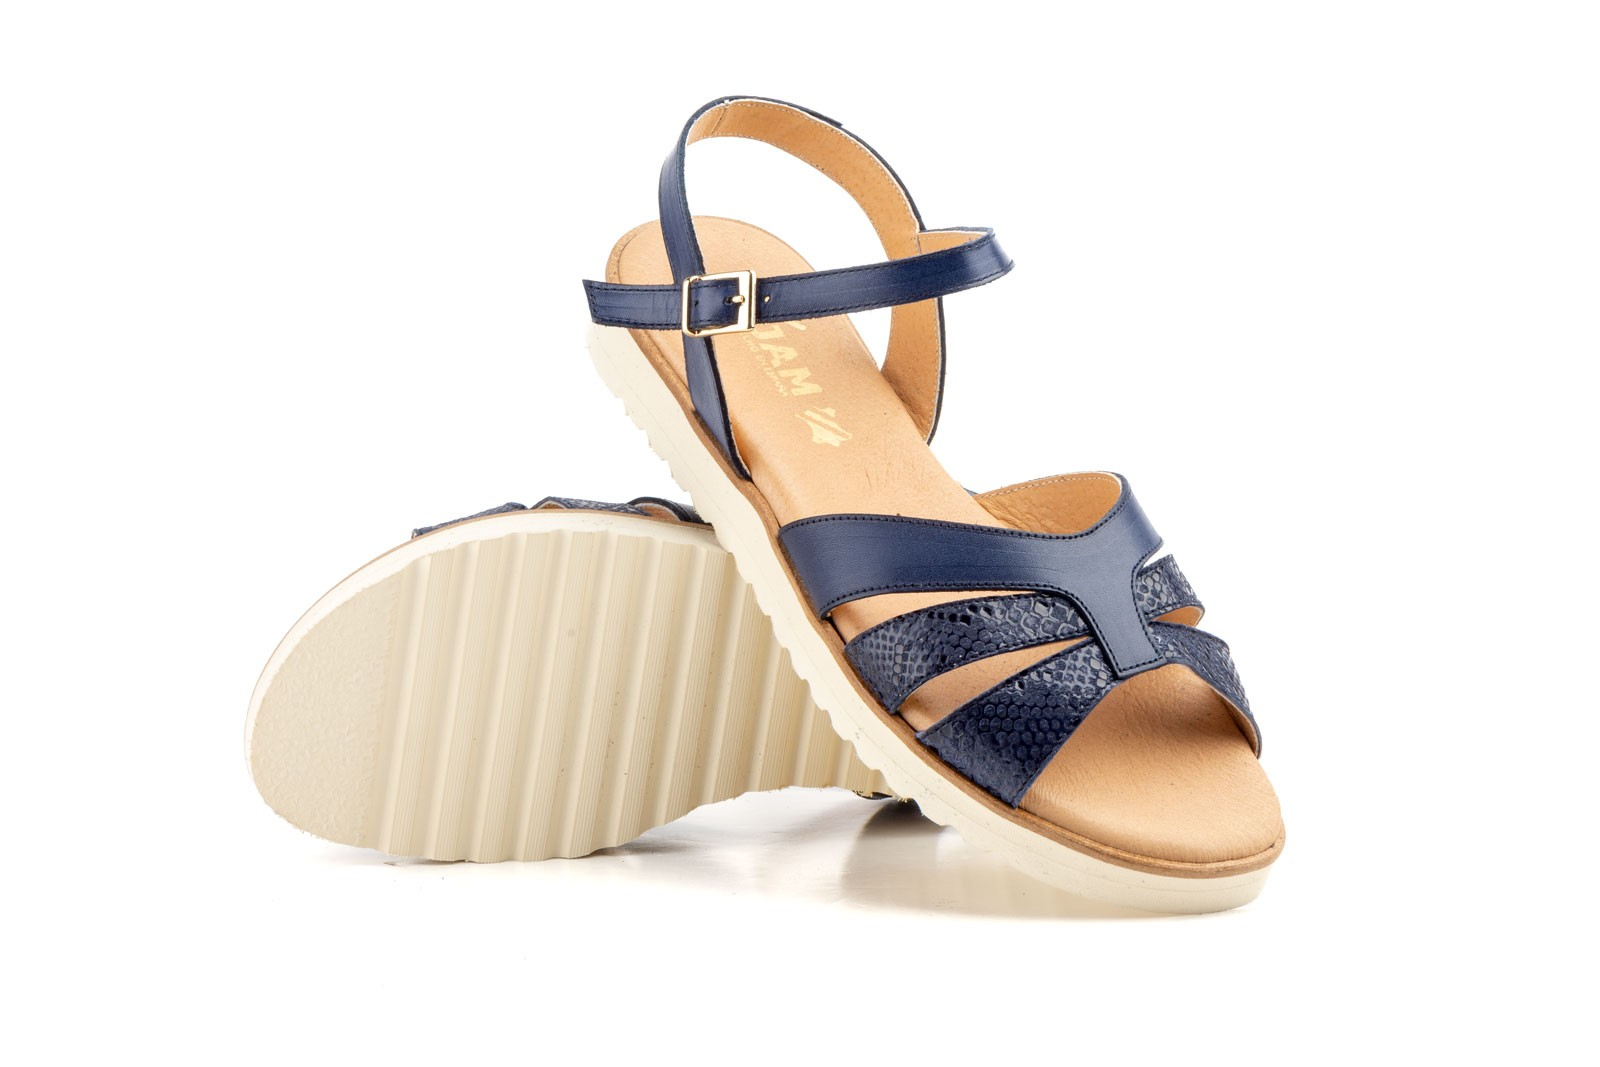 Women Sandals Navy Leather Floor Flat Eva Sizes Large JAM ZANCADAS-2050P-XXL53,90€